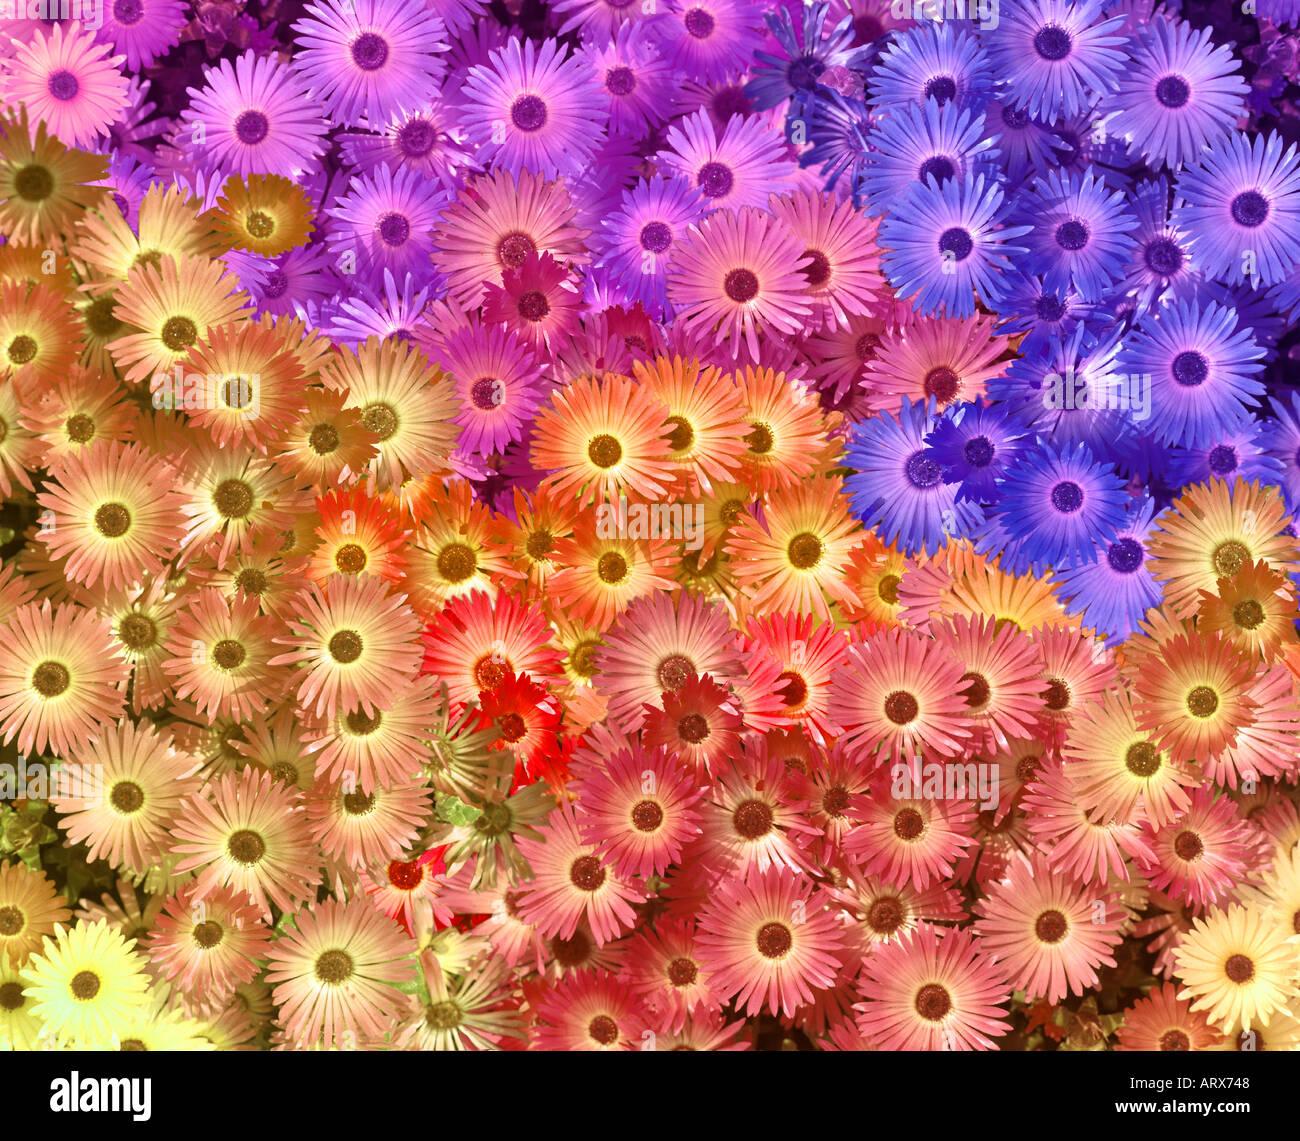 Arte Digital: adorno floral Imagen De Stock